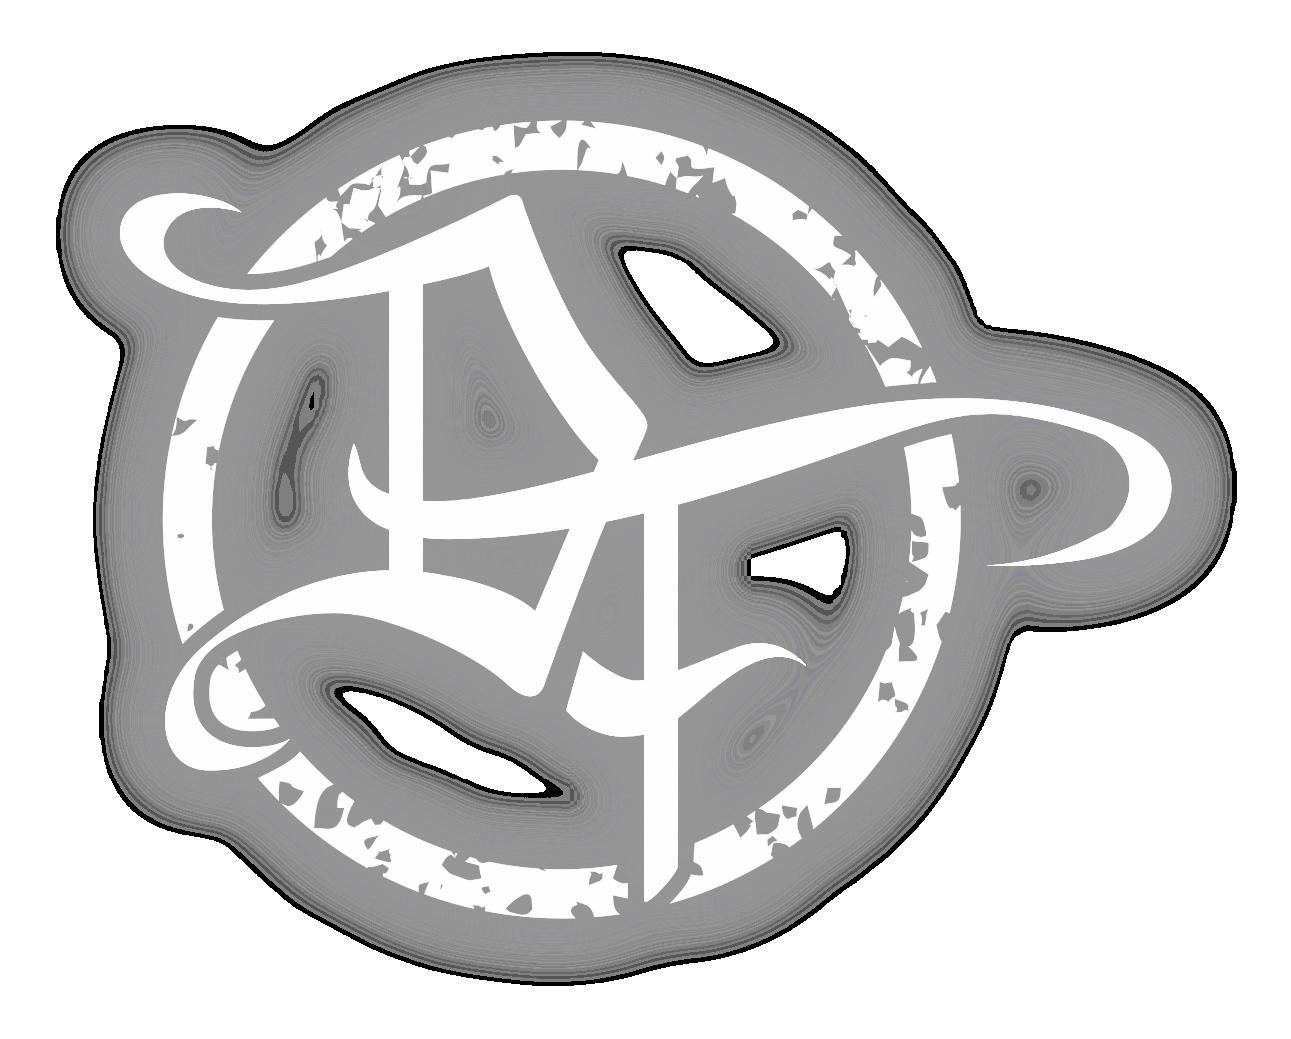 Draco Faucium Logo Mittelalterrock Band Sachsen